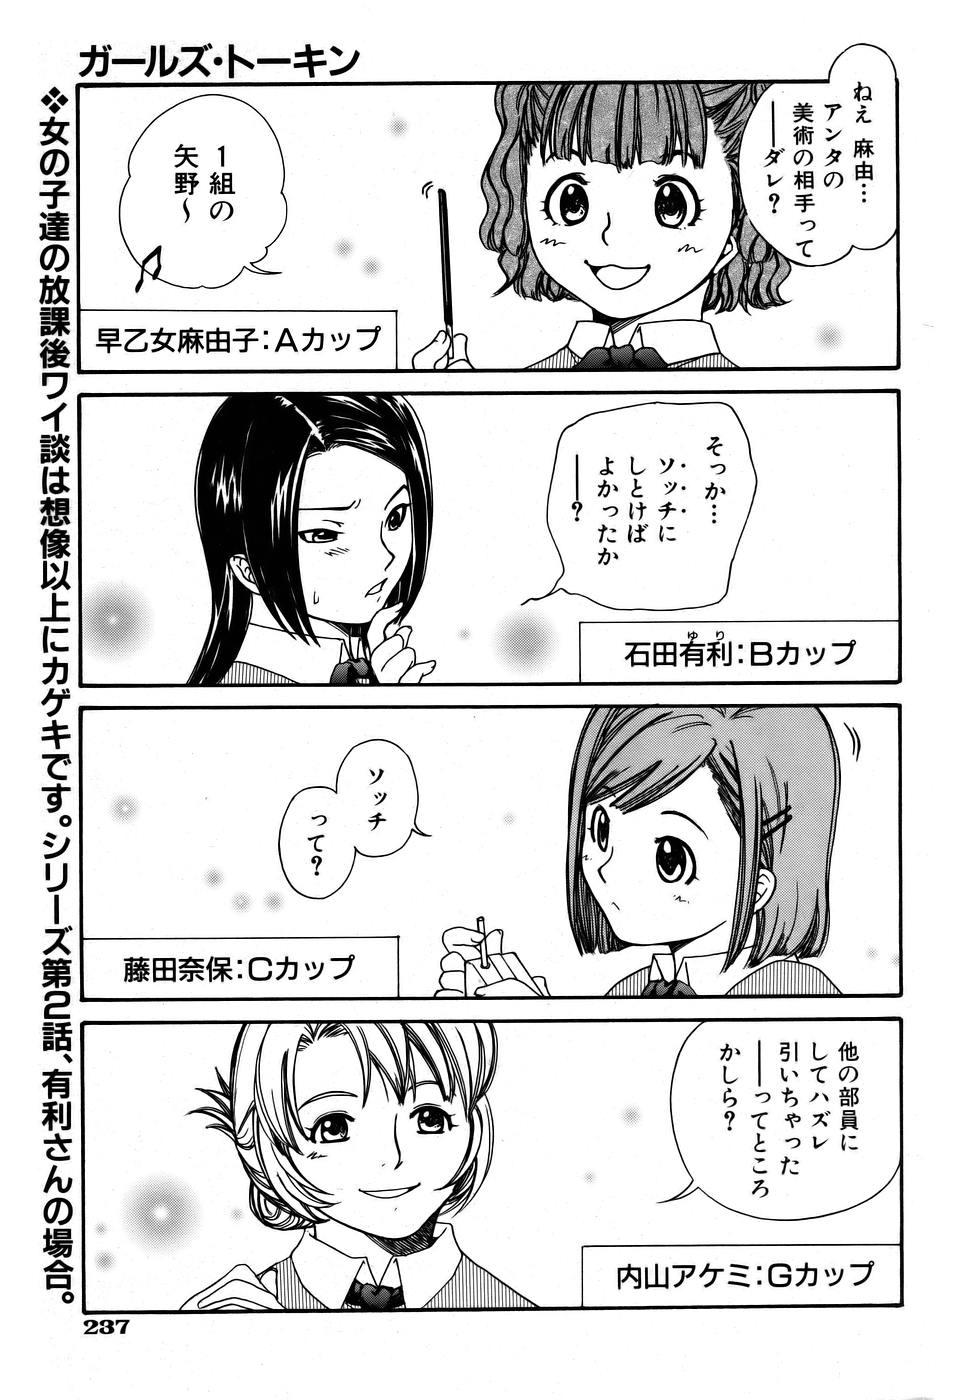 COMIC AUN 2005-12 Vol. 115 234